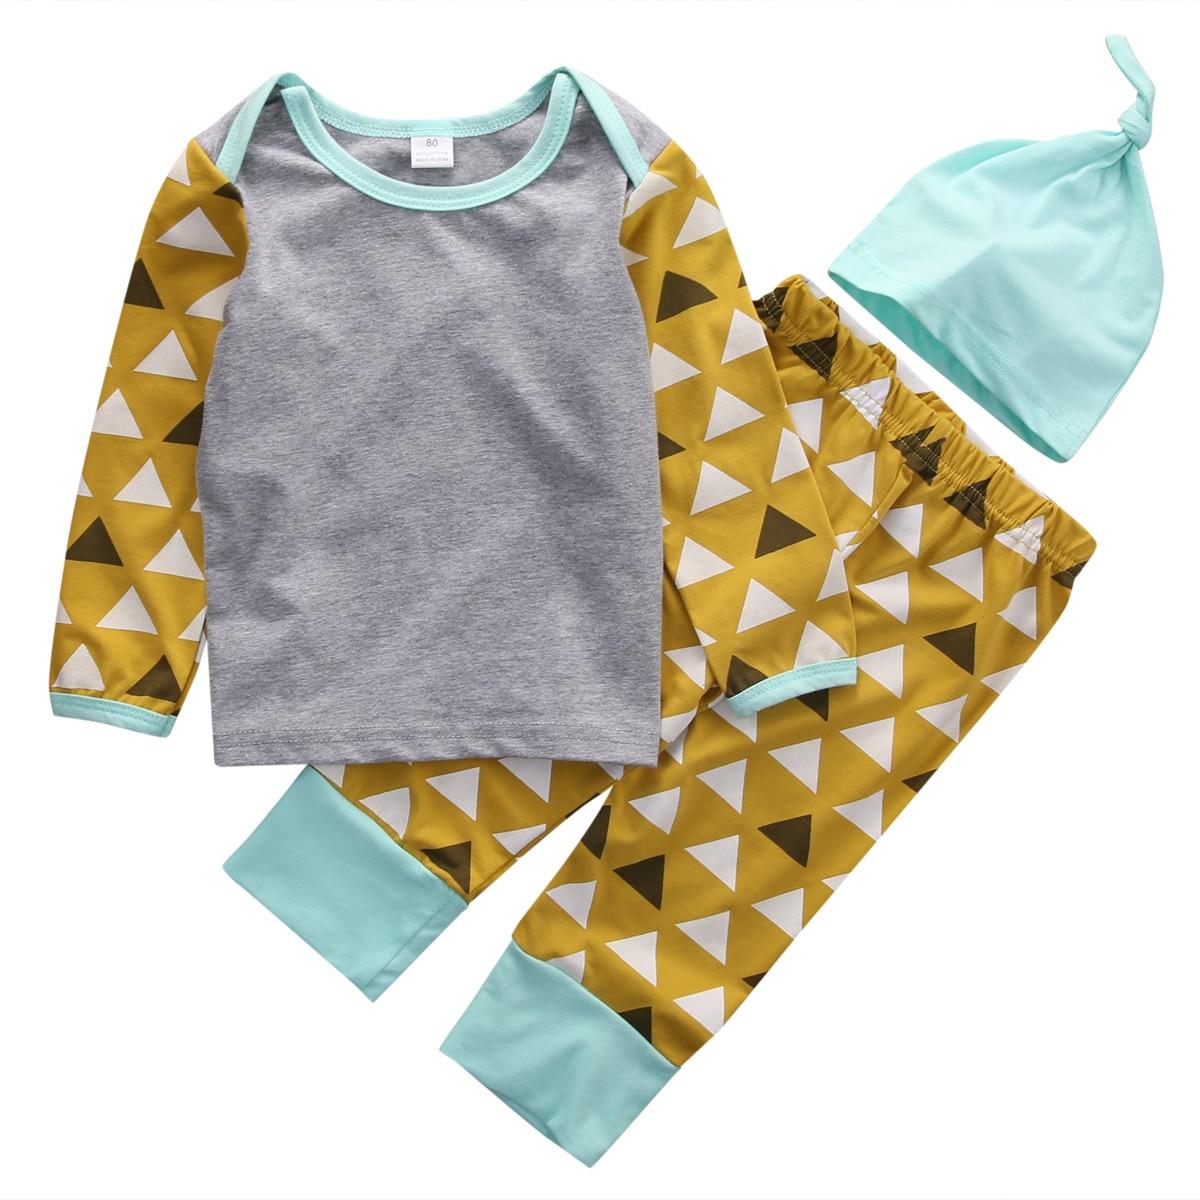 2016 Autumn Newborn Baby Boy Girl Clothes Suit 3pcs Long Sleeve T-shirt Top Pant Hat Outfits Casual Bebek Giyim Clothing Set